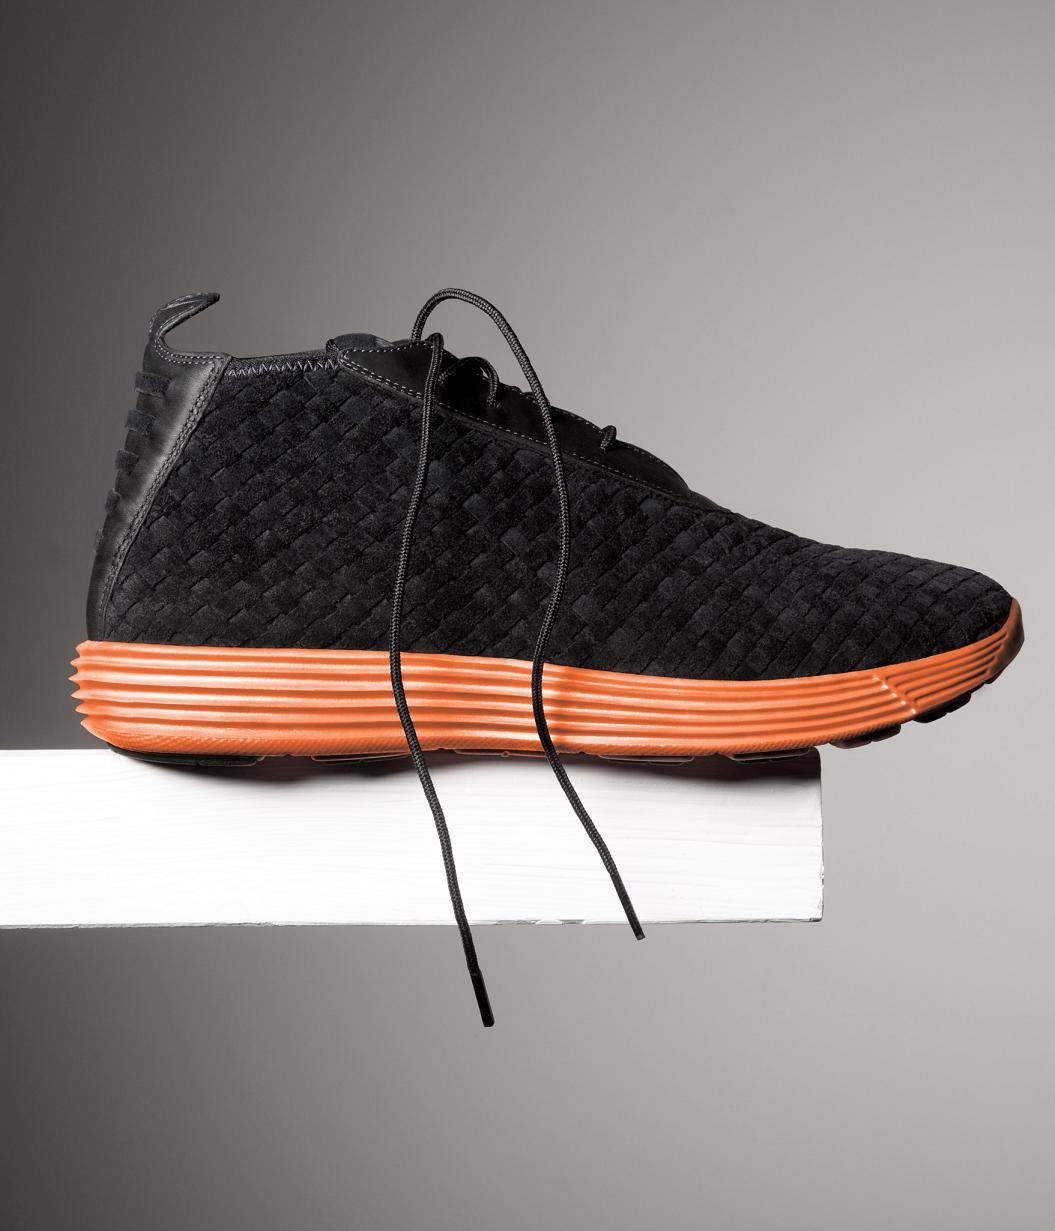 Nike-LunarLite-Chukka-Woven-Netherlands.jpg (1055×1231)